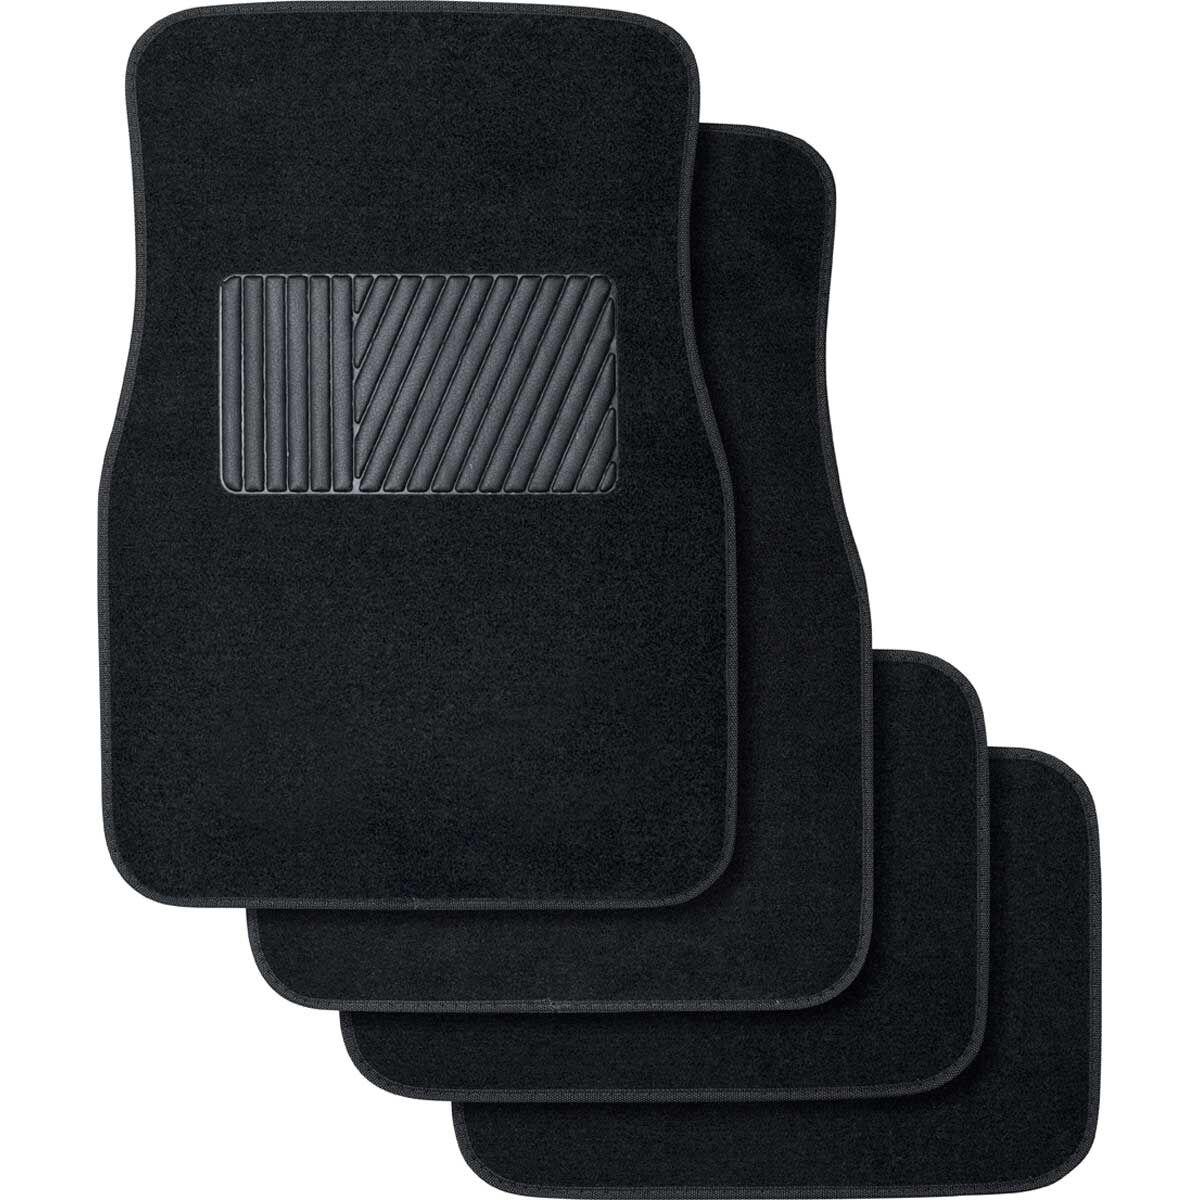 Heavy Duty Carpet For Peugeot Quality Set Of Black Pioneer Mats All Carpet